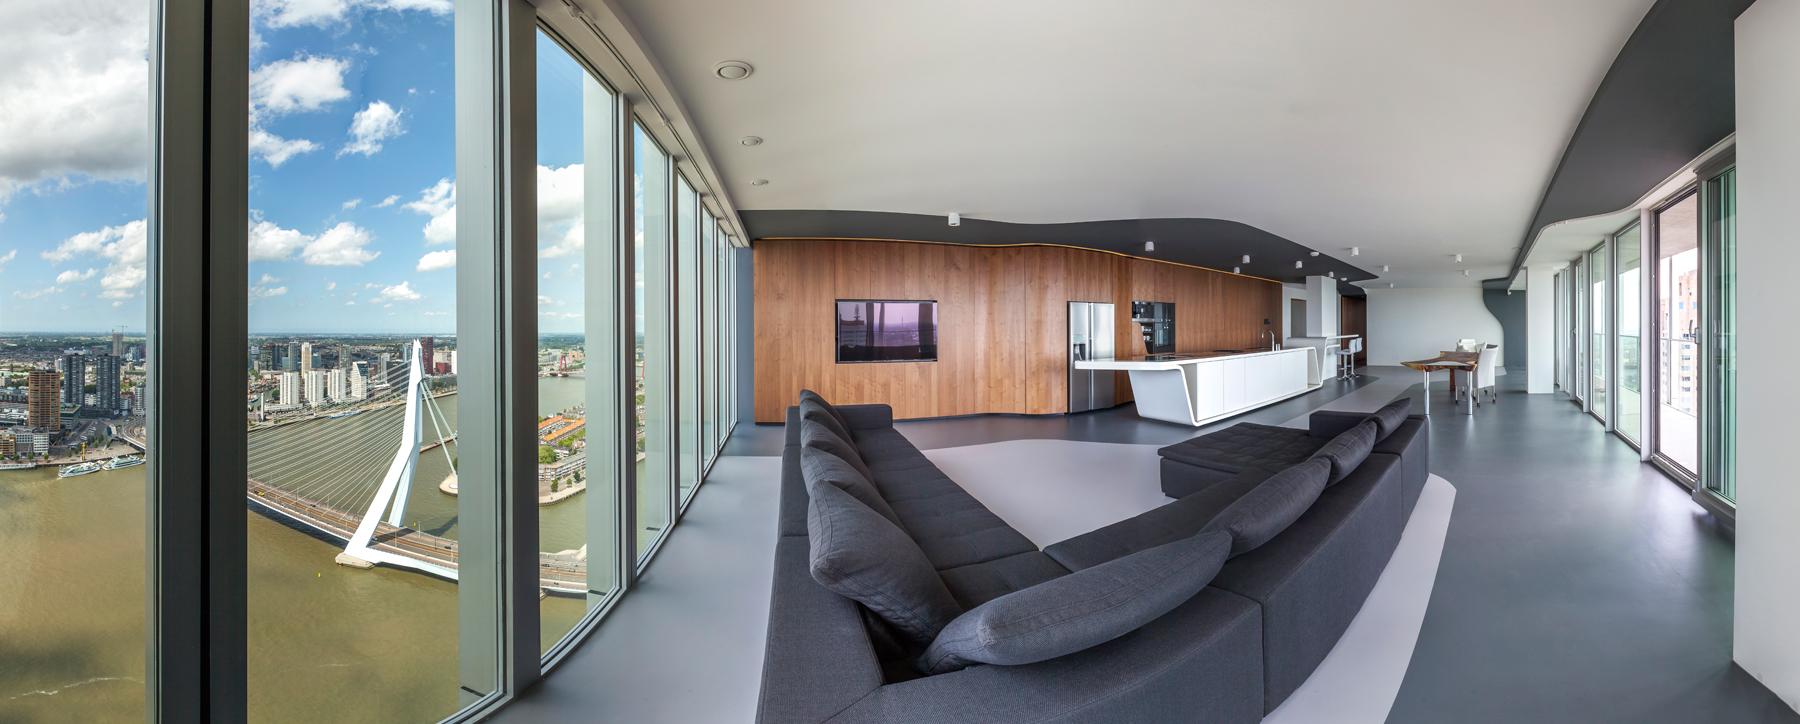 5_123dv_de-rotterdam-suite_inspirationist